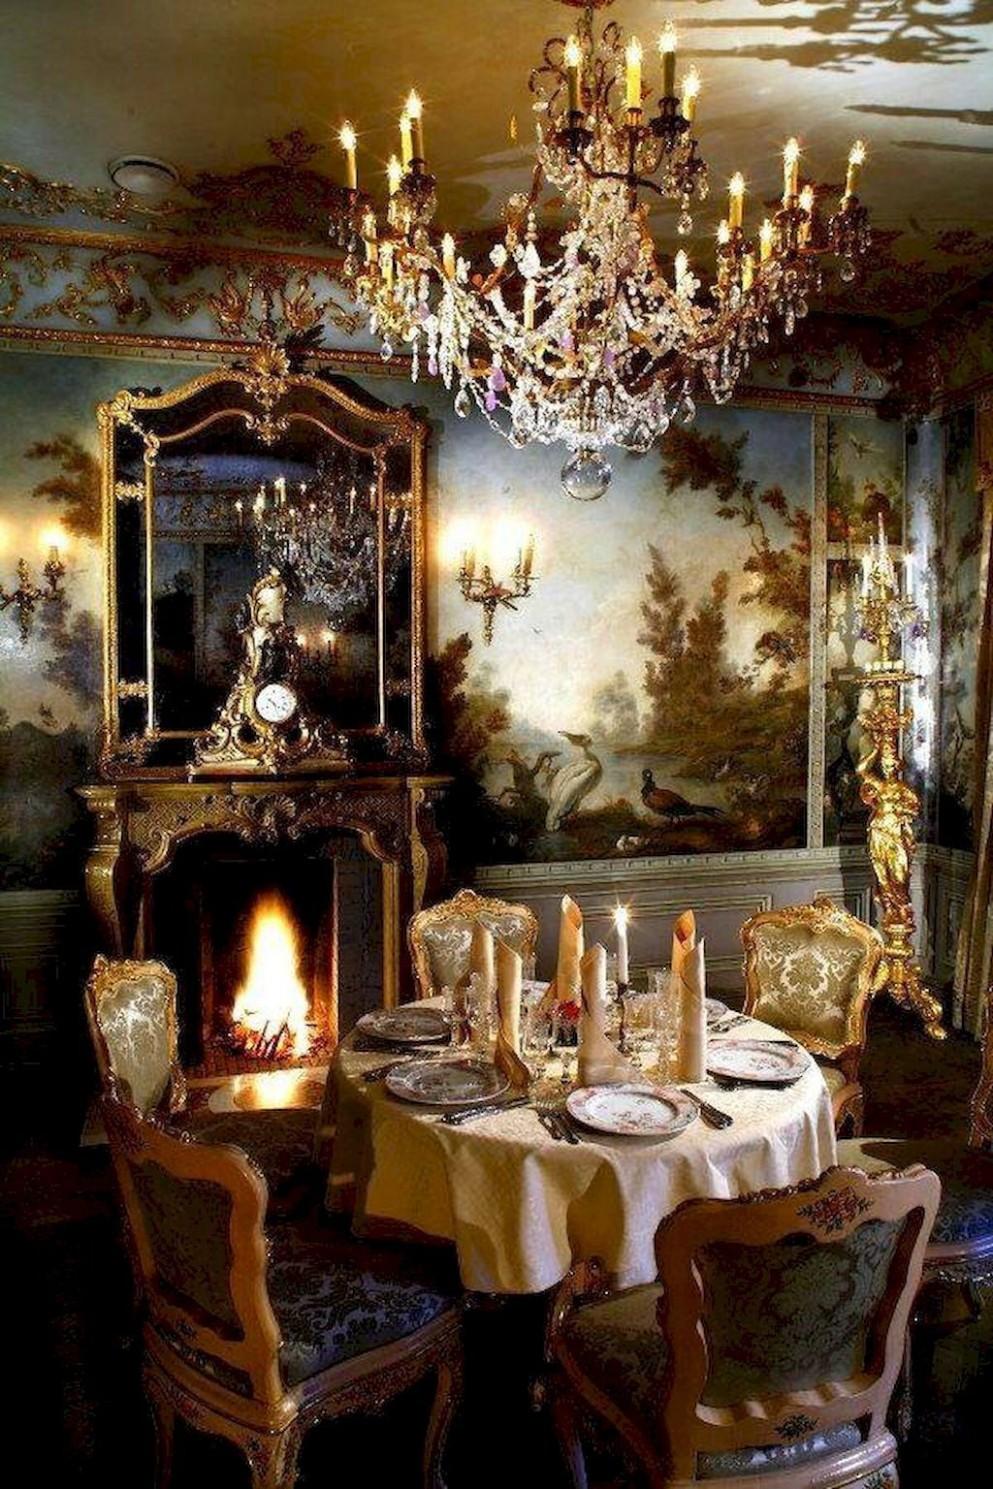 8 vintage victorian dining room decor ideas (8)  Dining room  - Dining Room Ideas Victorian